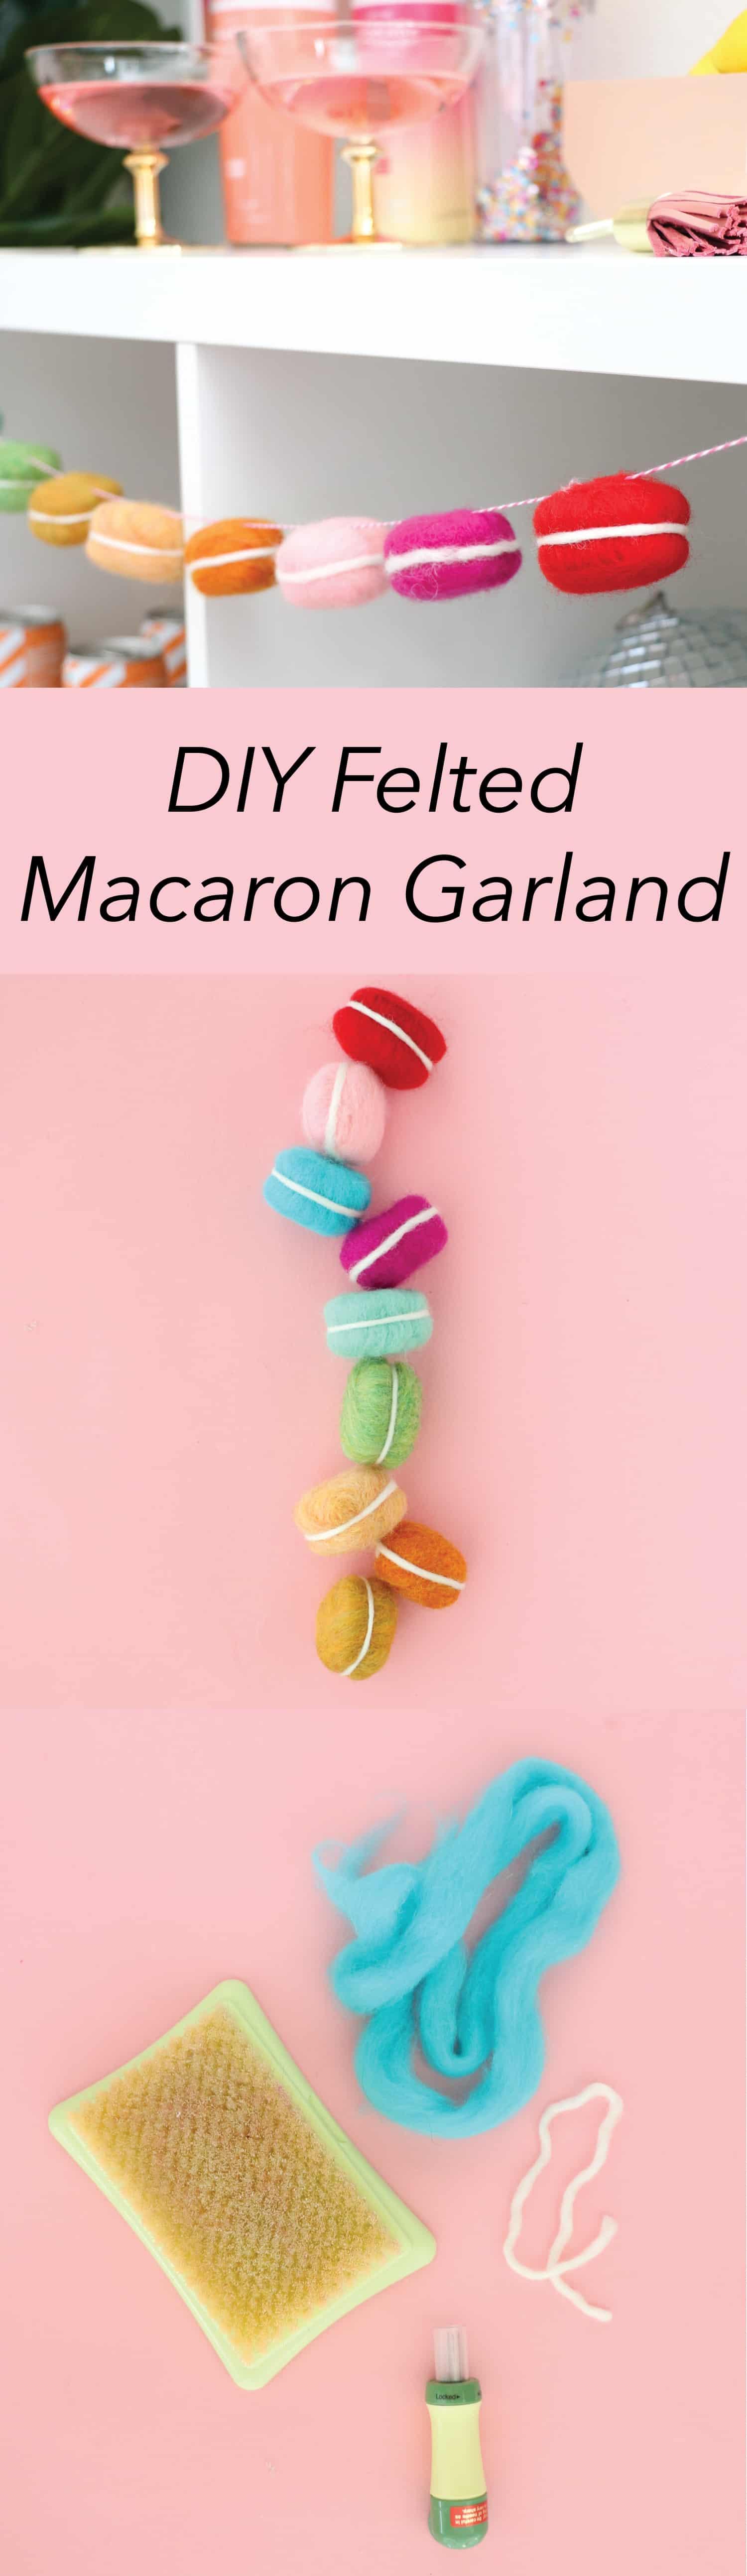 DIY-Felted-Macaron-Garland1